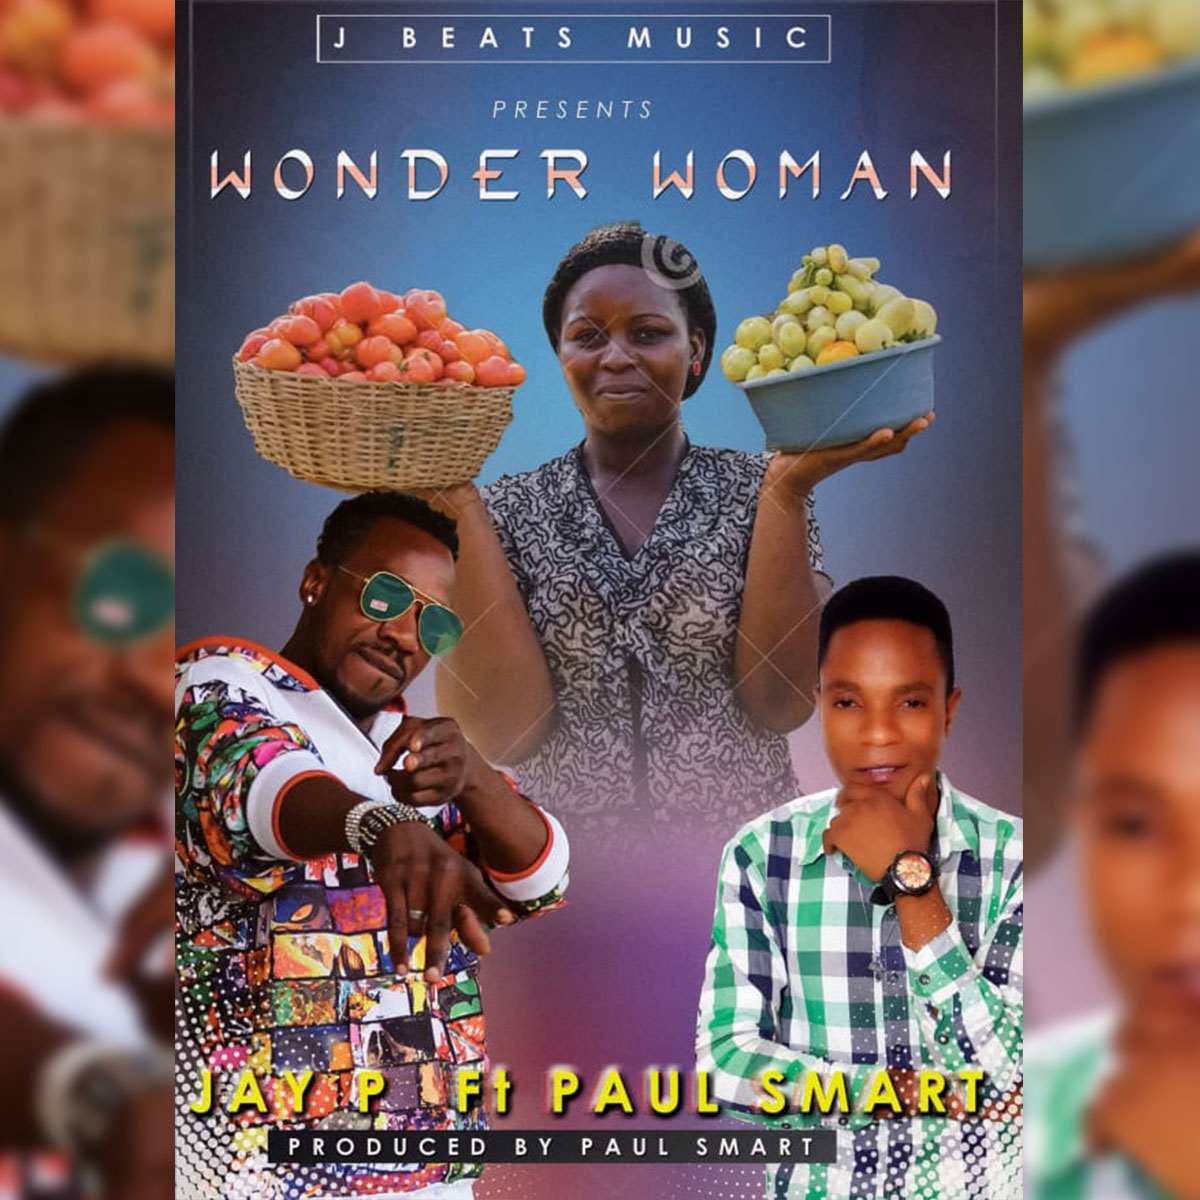 Jay P ft. Paul Smart - Wonder Woman LARGE